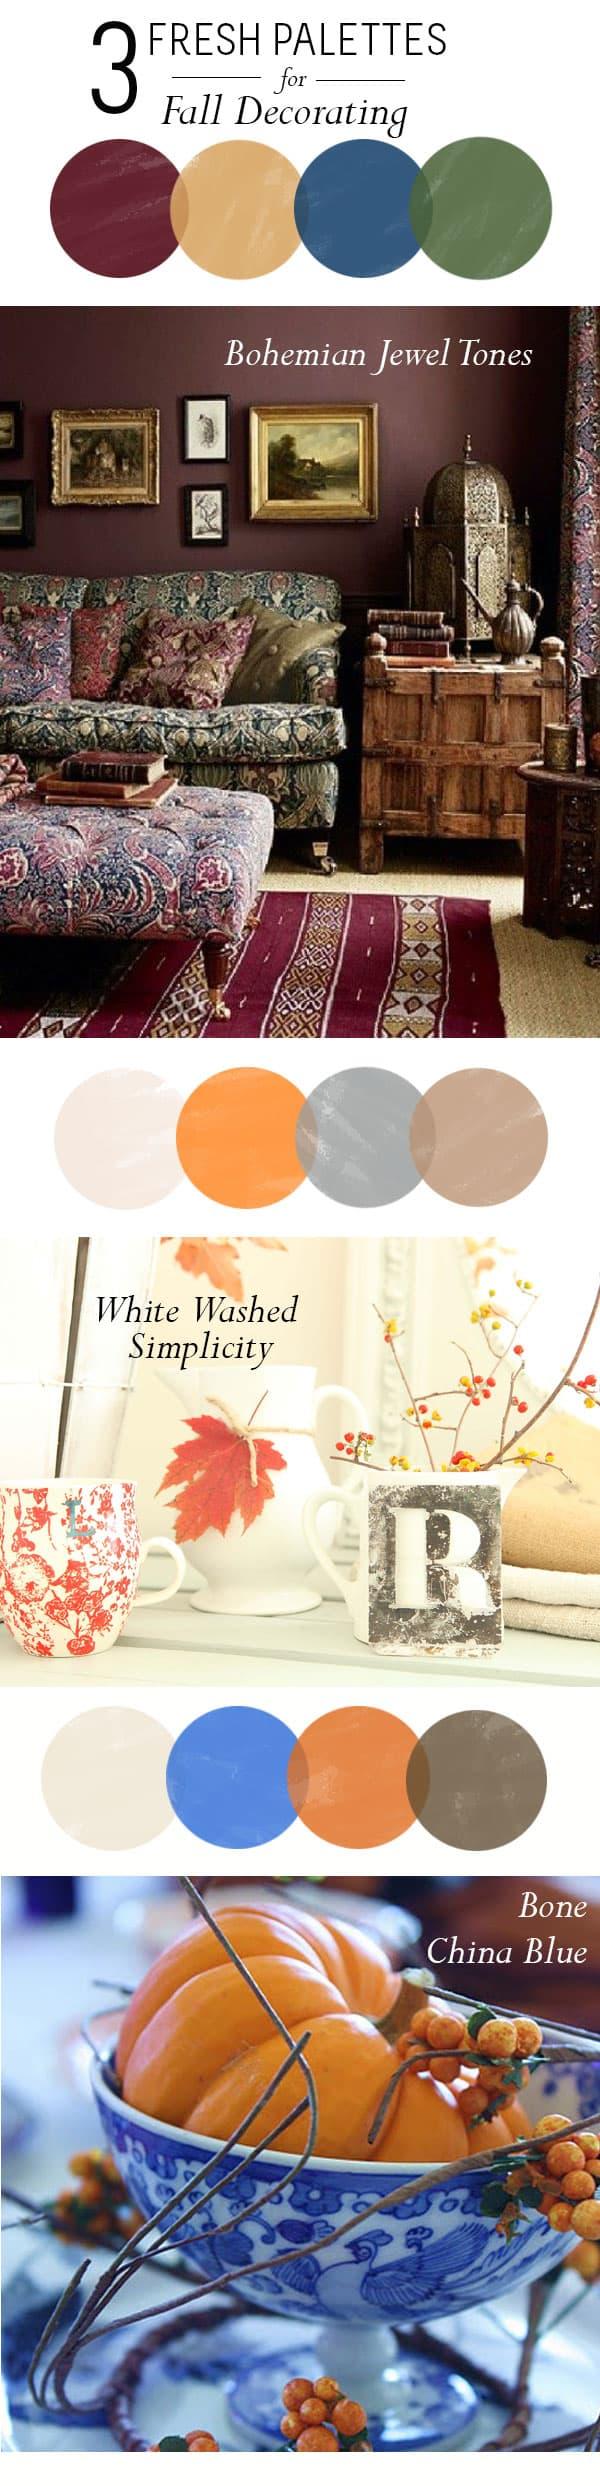 Fall decorating colors